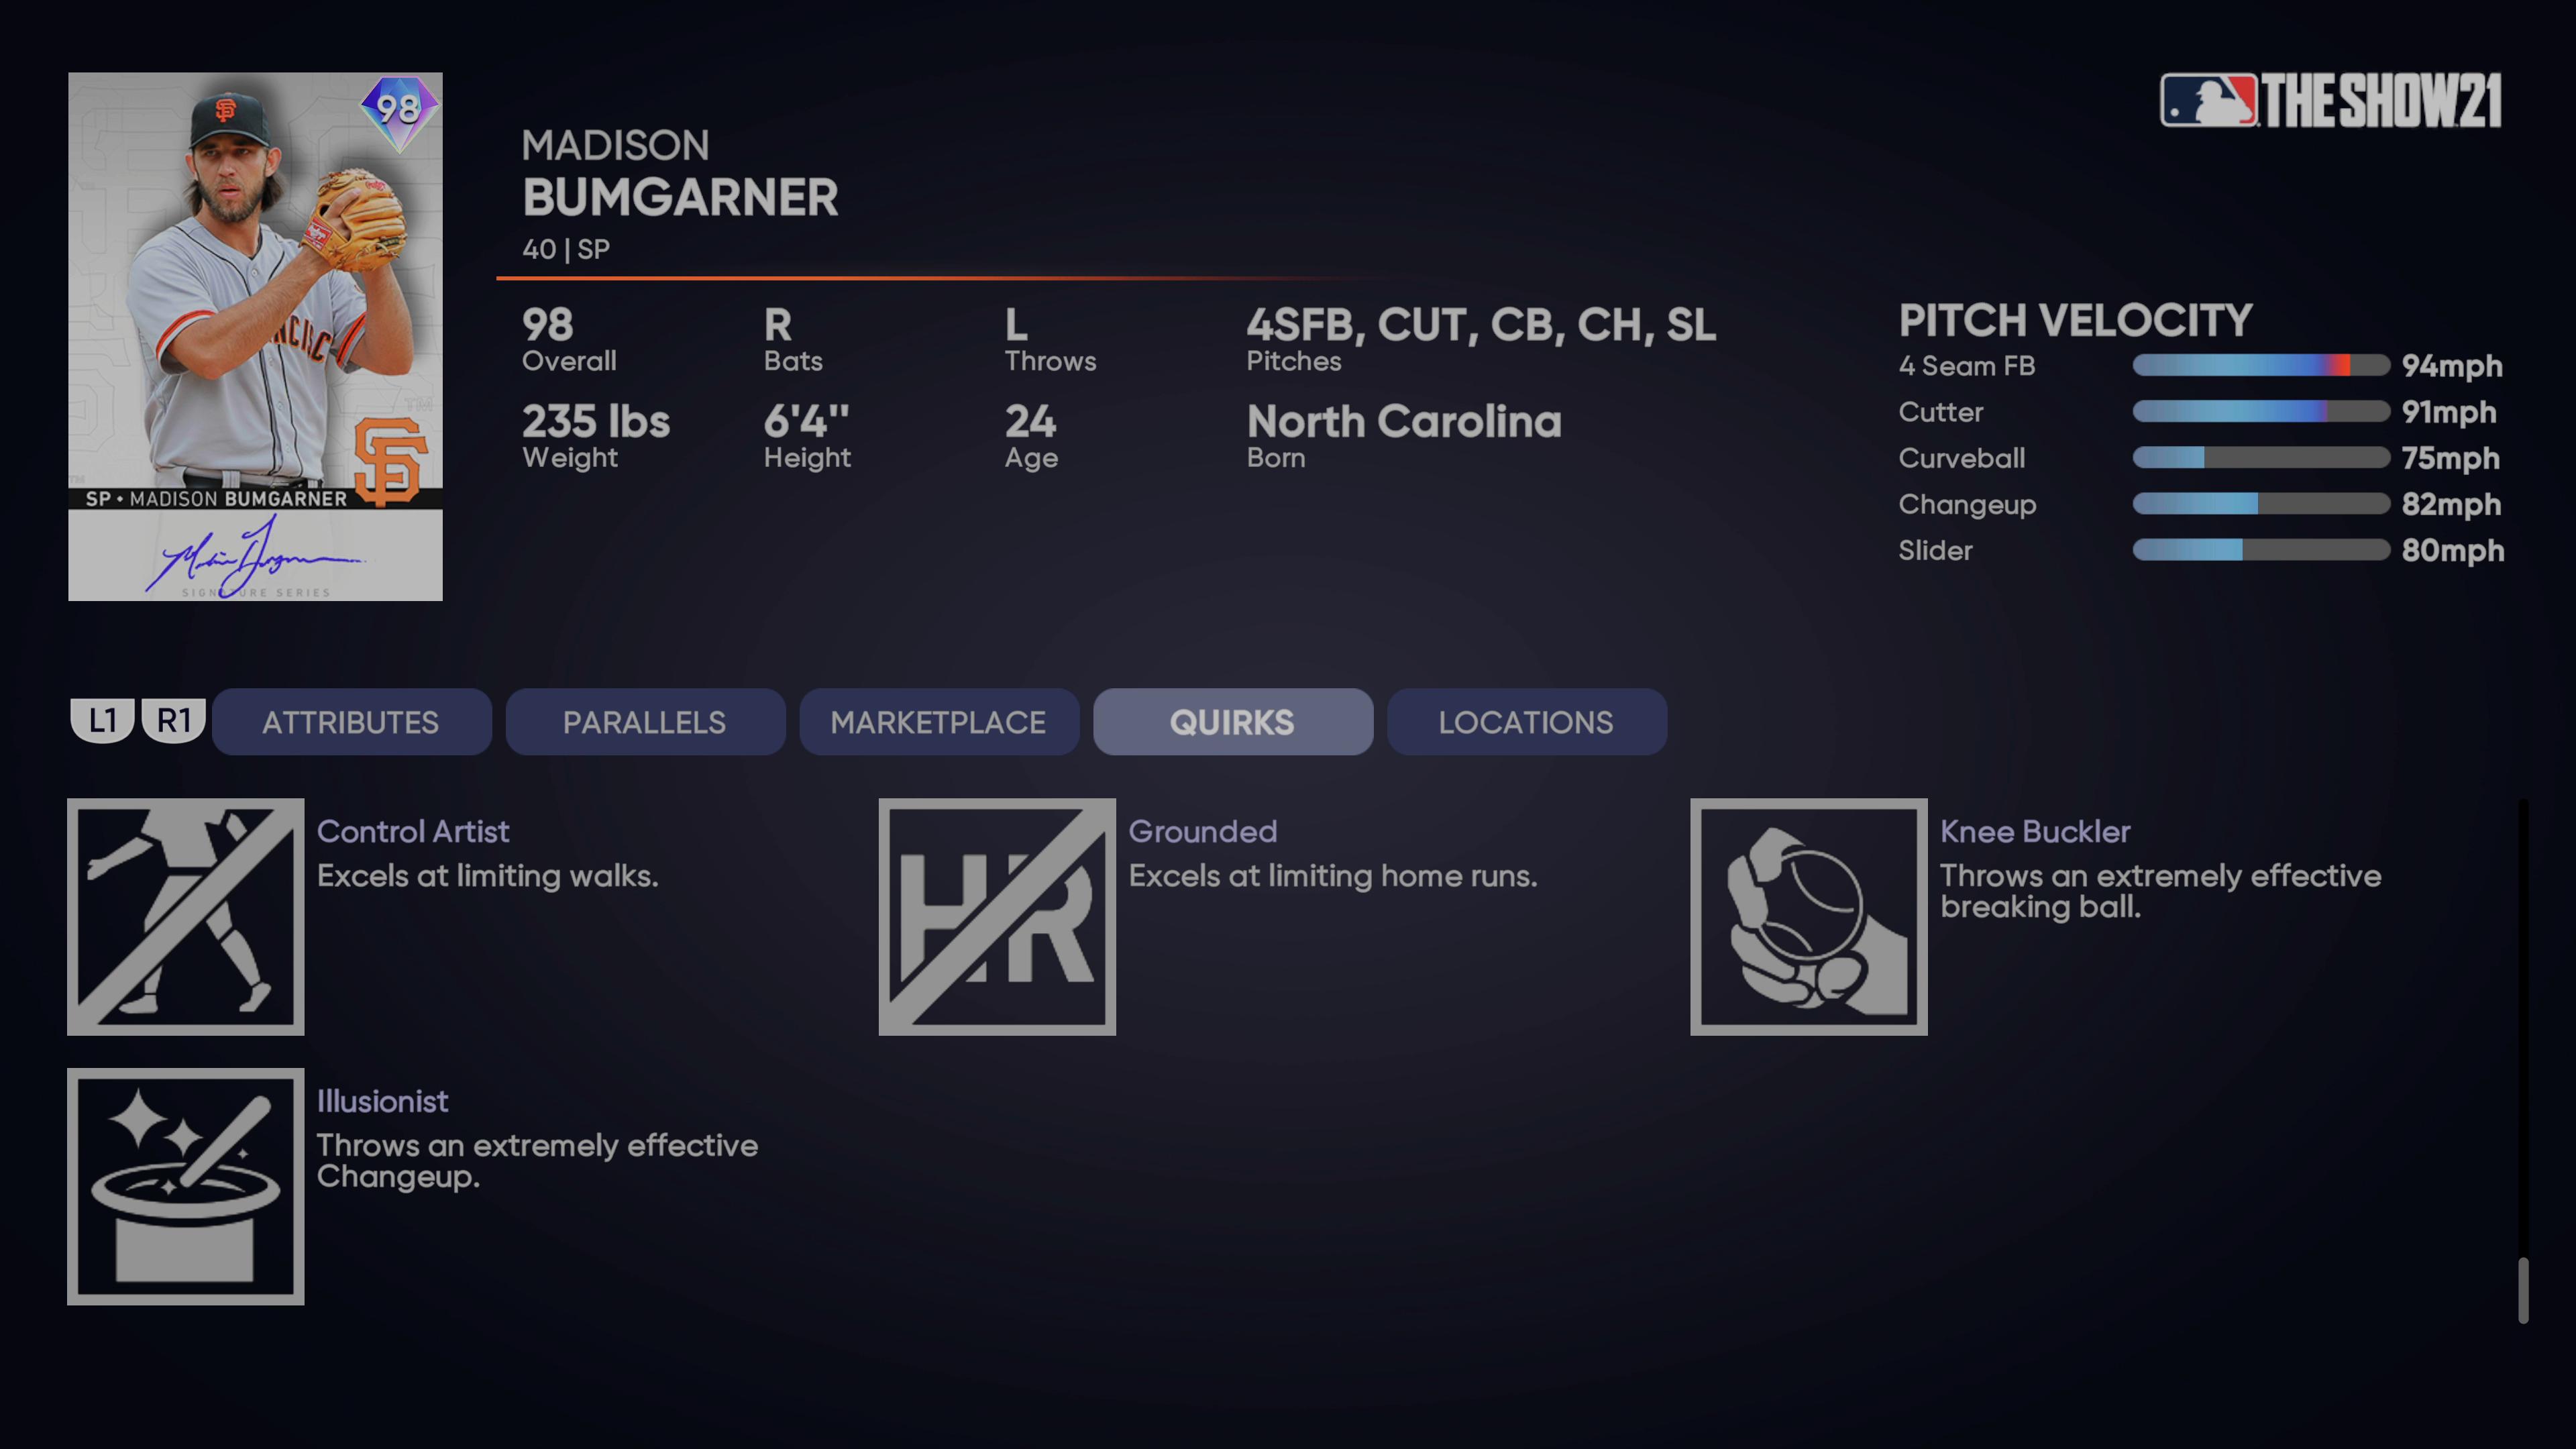 MLB The Show 21 - Headliners Set 32 Signature Series Madison Bumgarner_2021-08-24_15-26-14